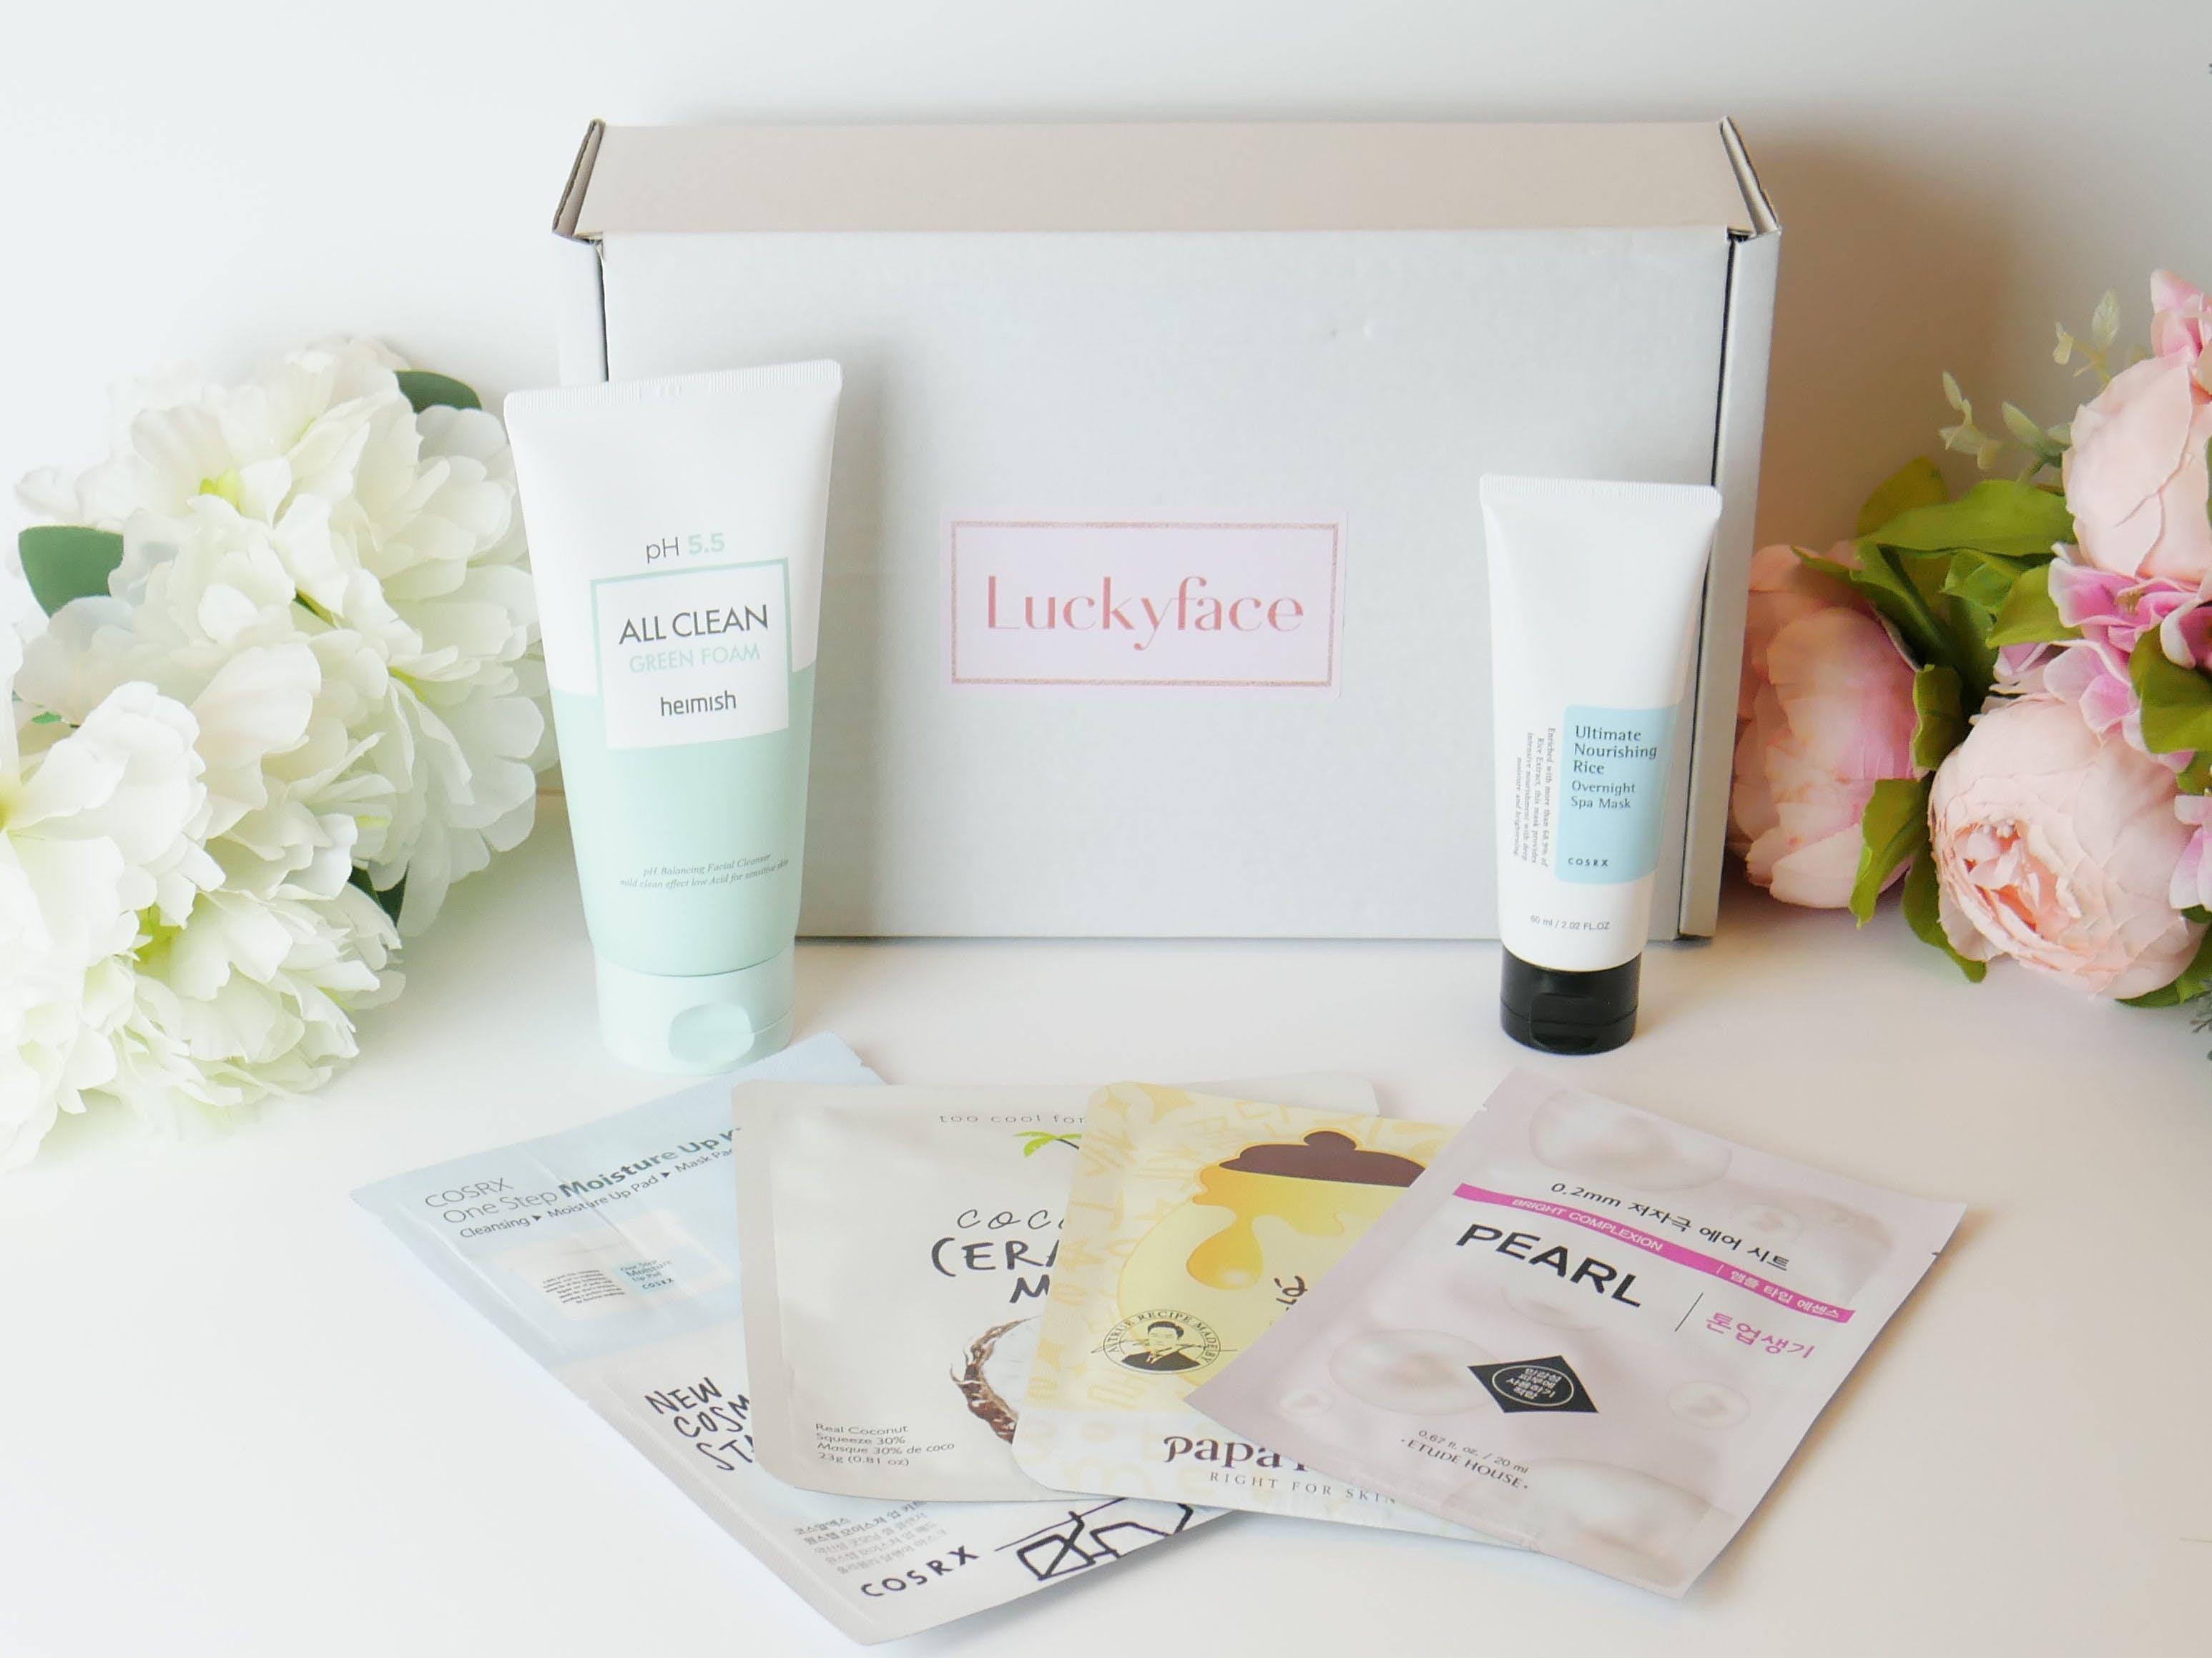 Luckyface - The Korean Beauty Glass Skin